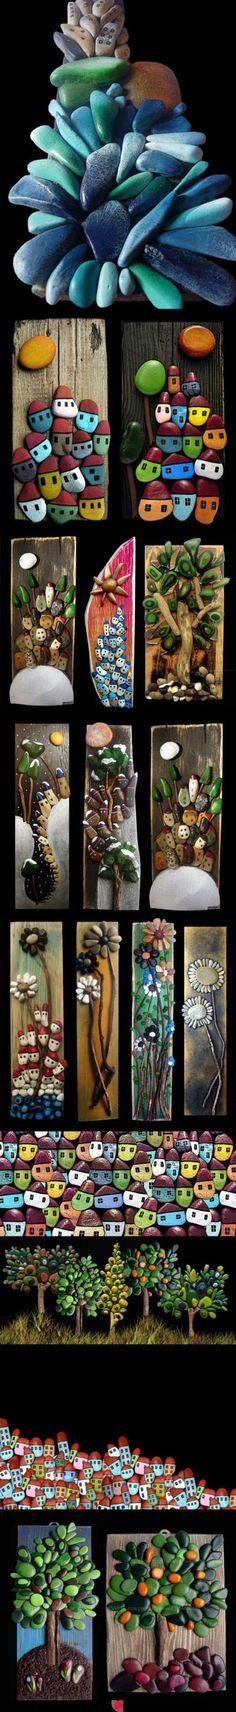 scrap wood + old sticks + smooth pebbles + paint & glue = fab art